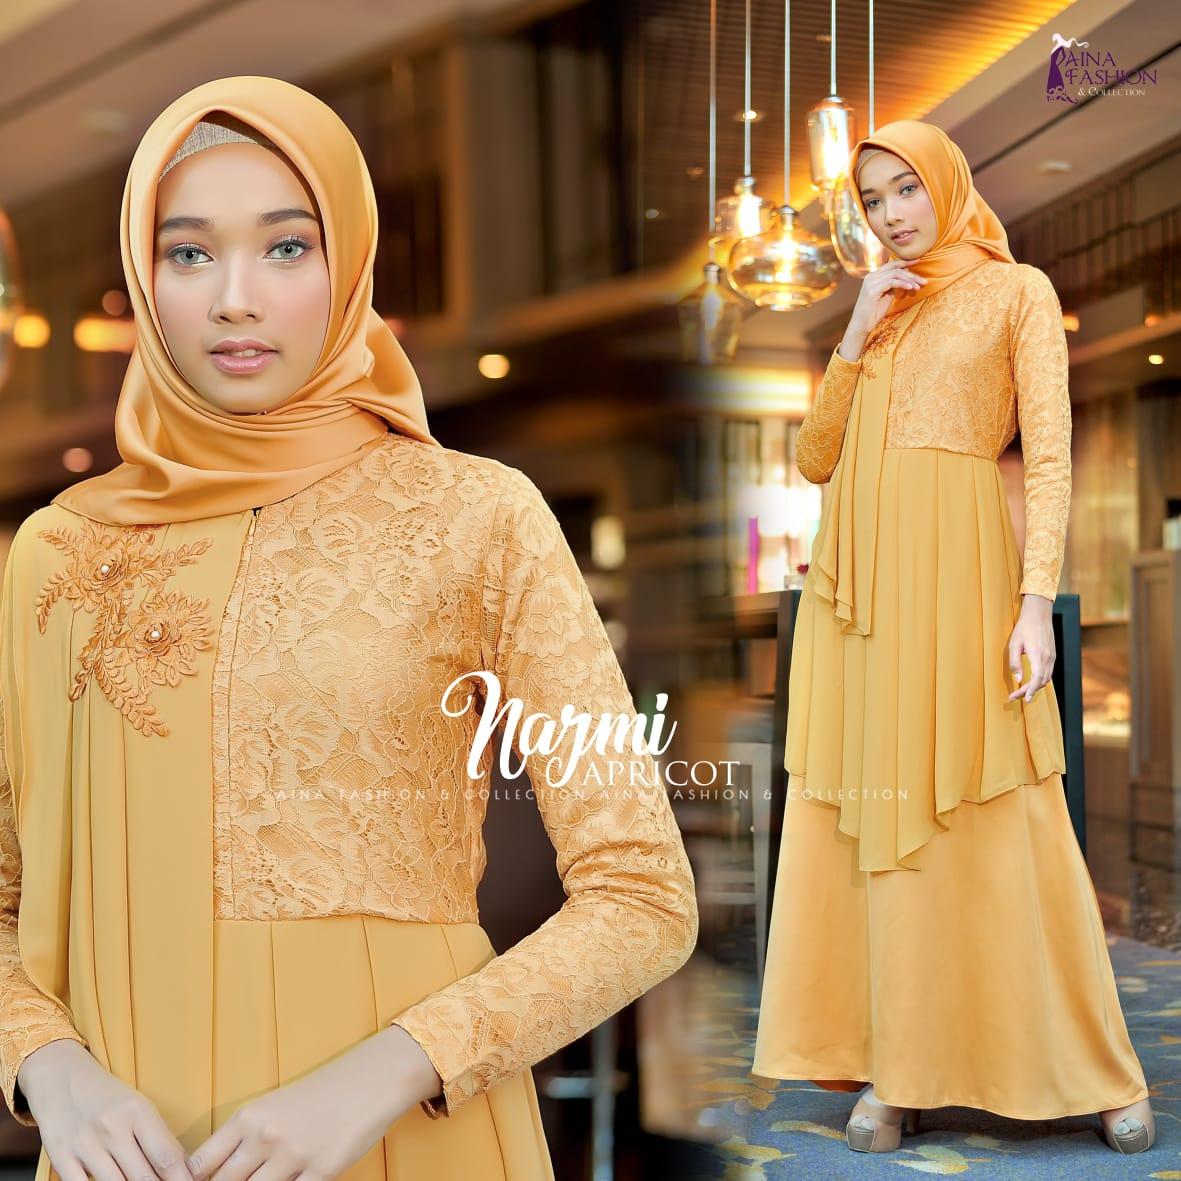 30+ Model Baju Muslim Wanita Terbaru 2020 - Fashion Modern ...